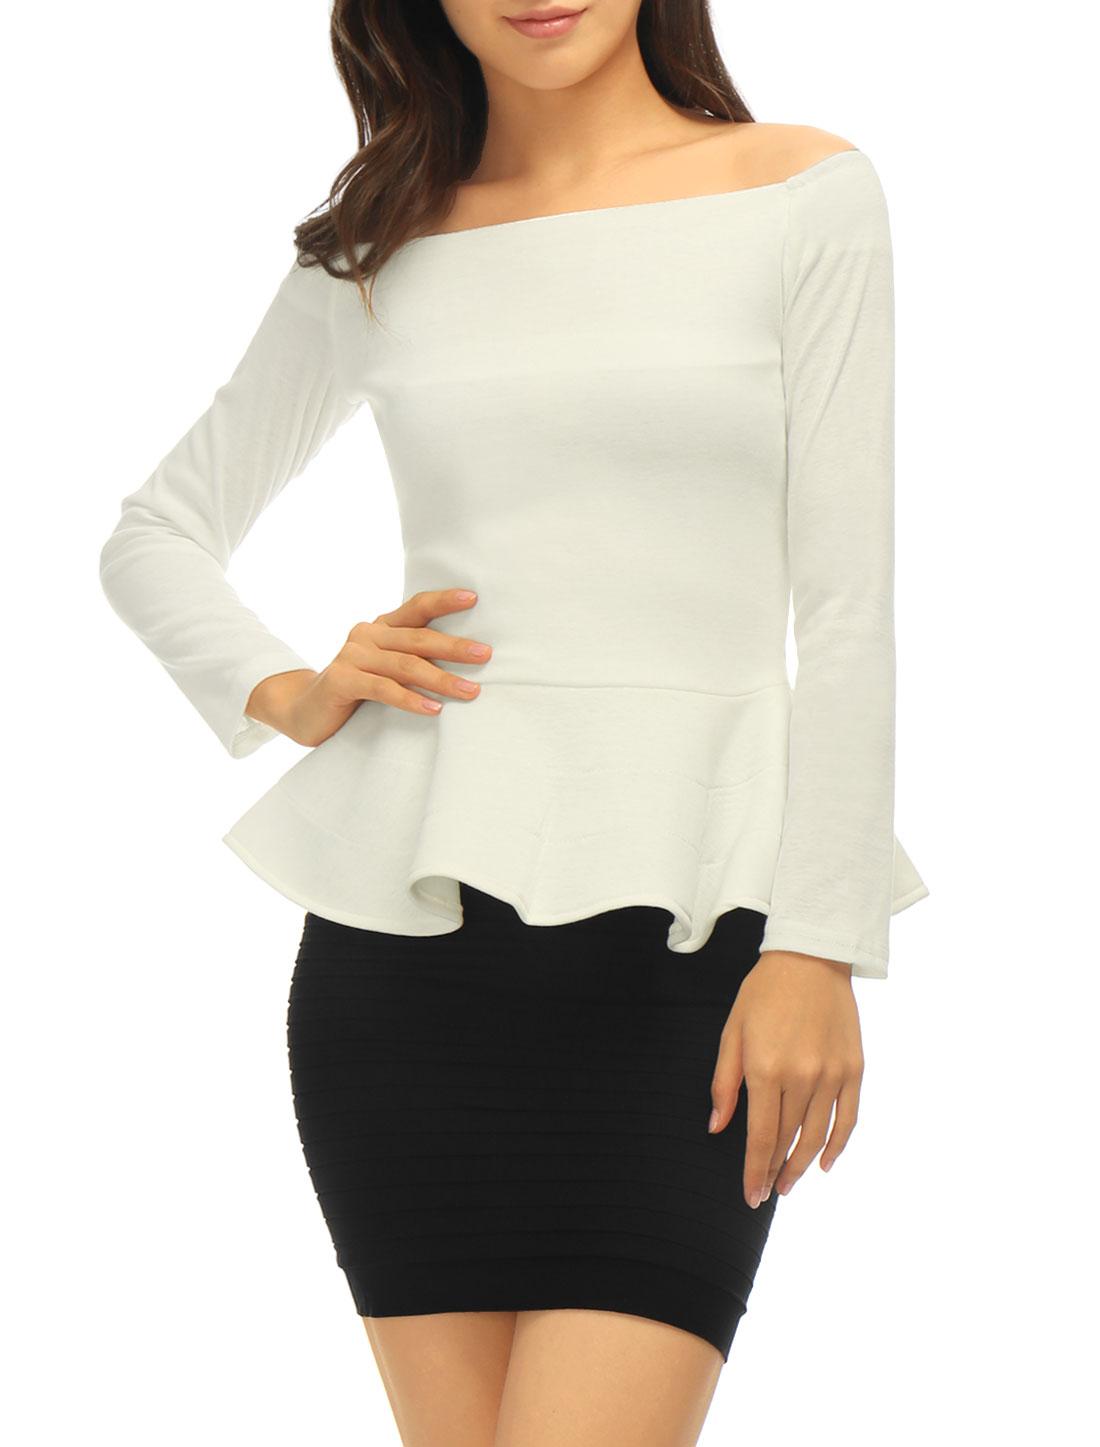 Women Off Shoulder Long Sleeves Slim Fit Peplum Top Off White S